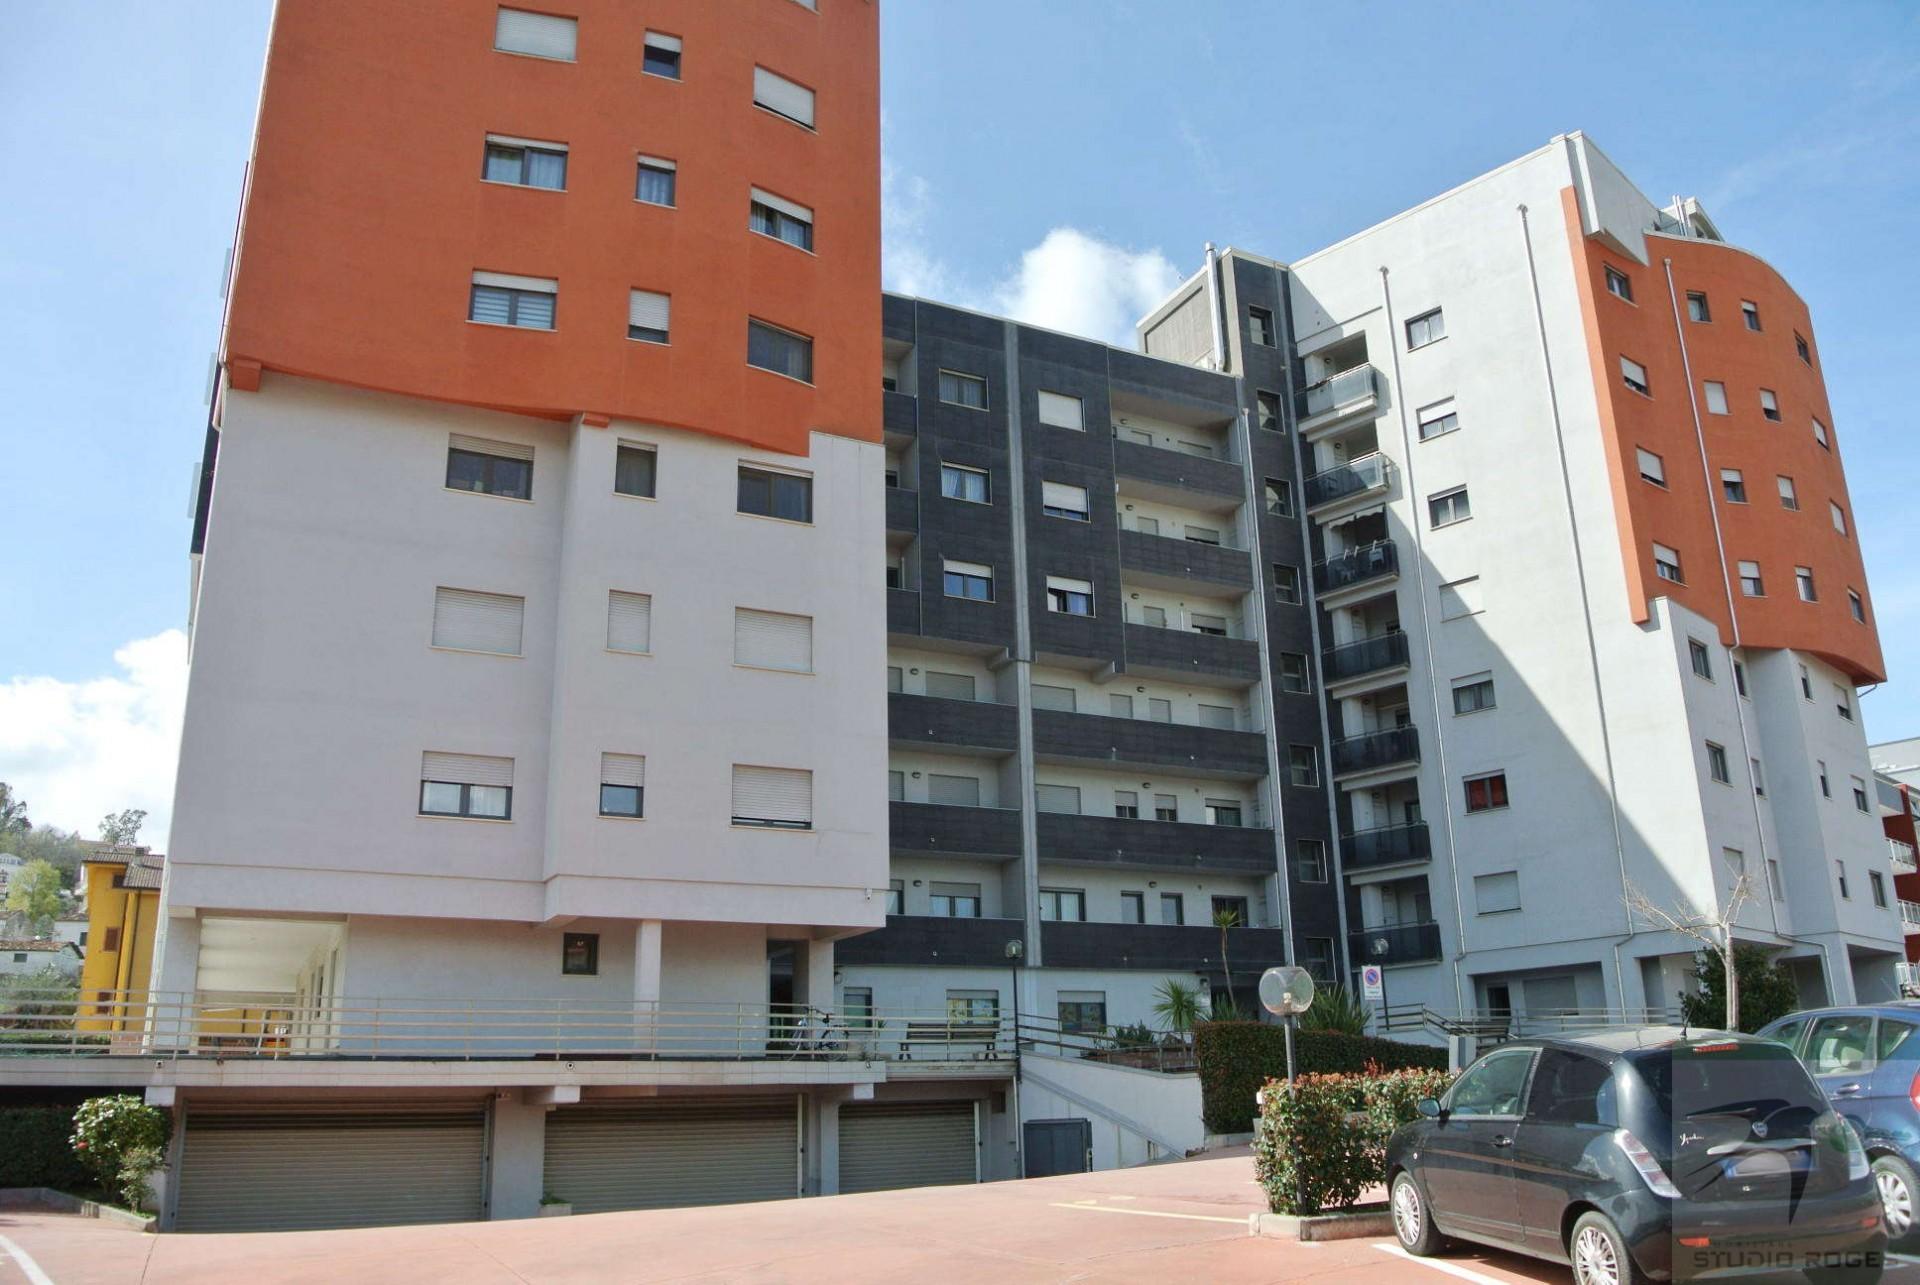 Appartamento in Vendita 114,00 mq - N. camere: 3 - - Rende - Roges-Commenda (CS)